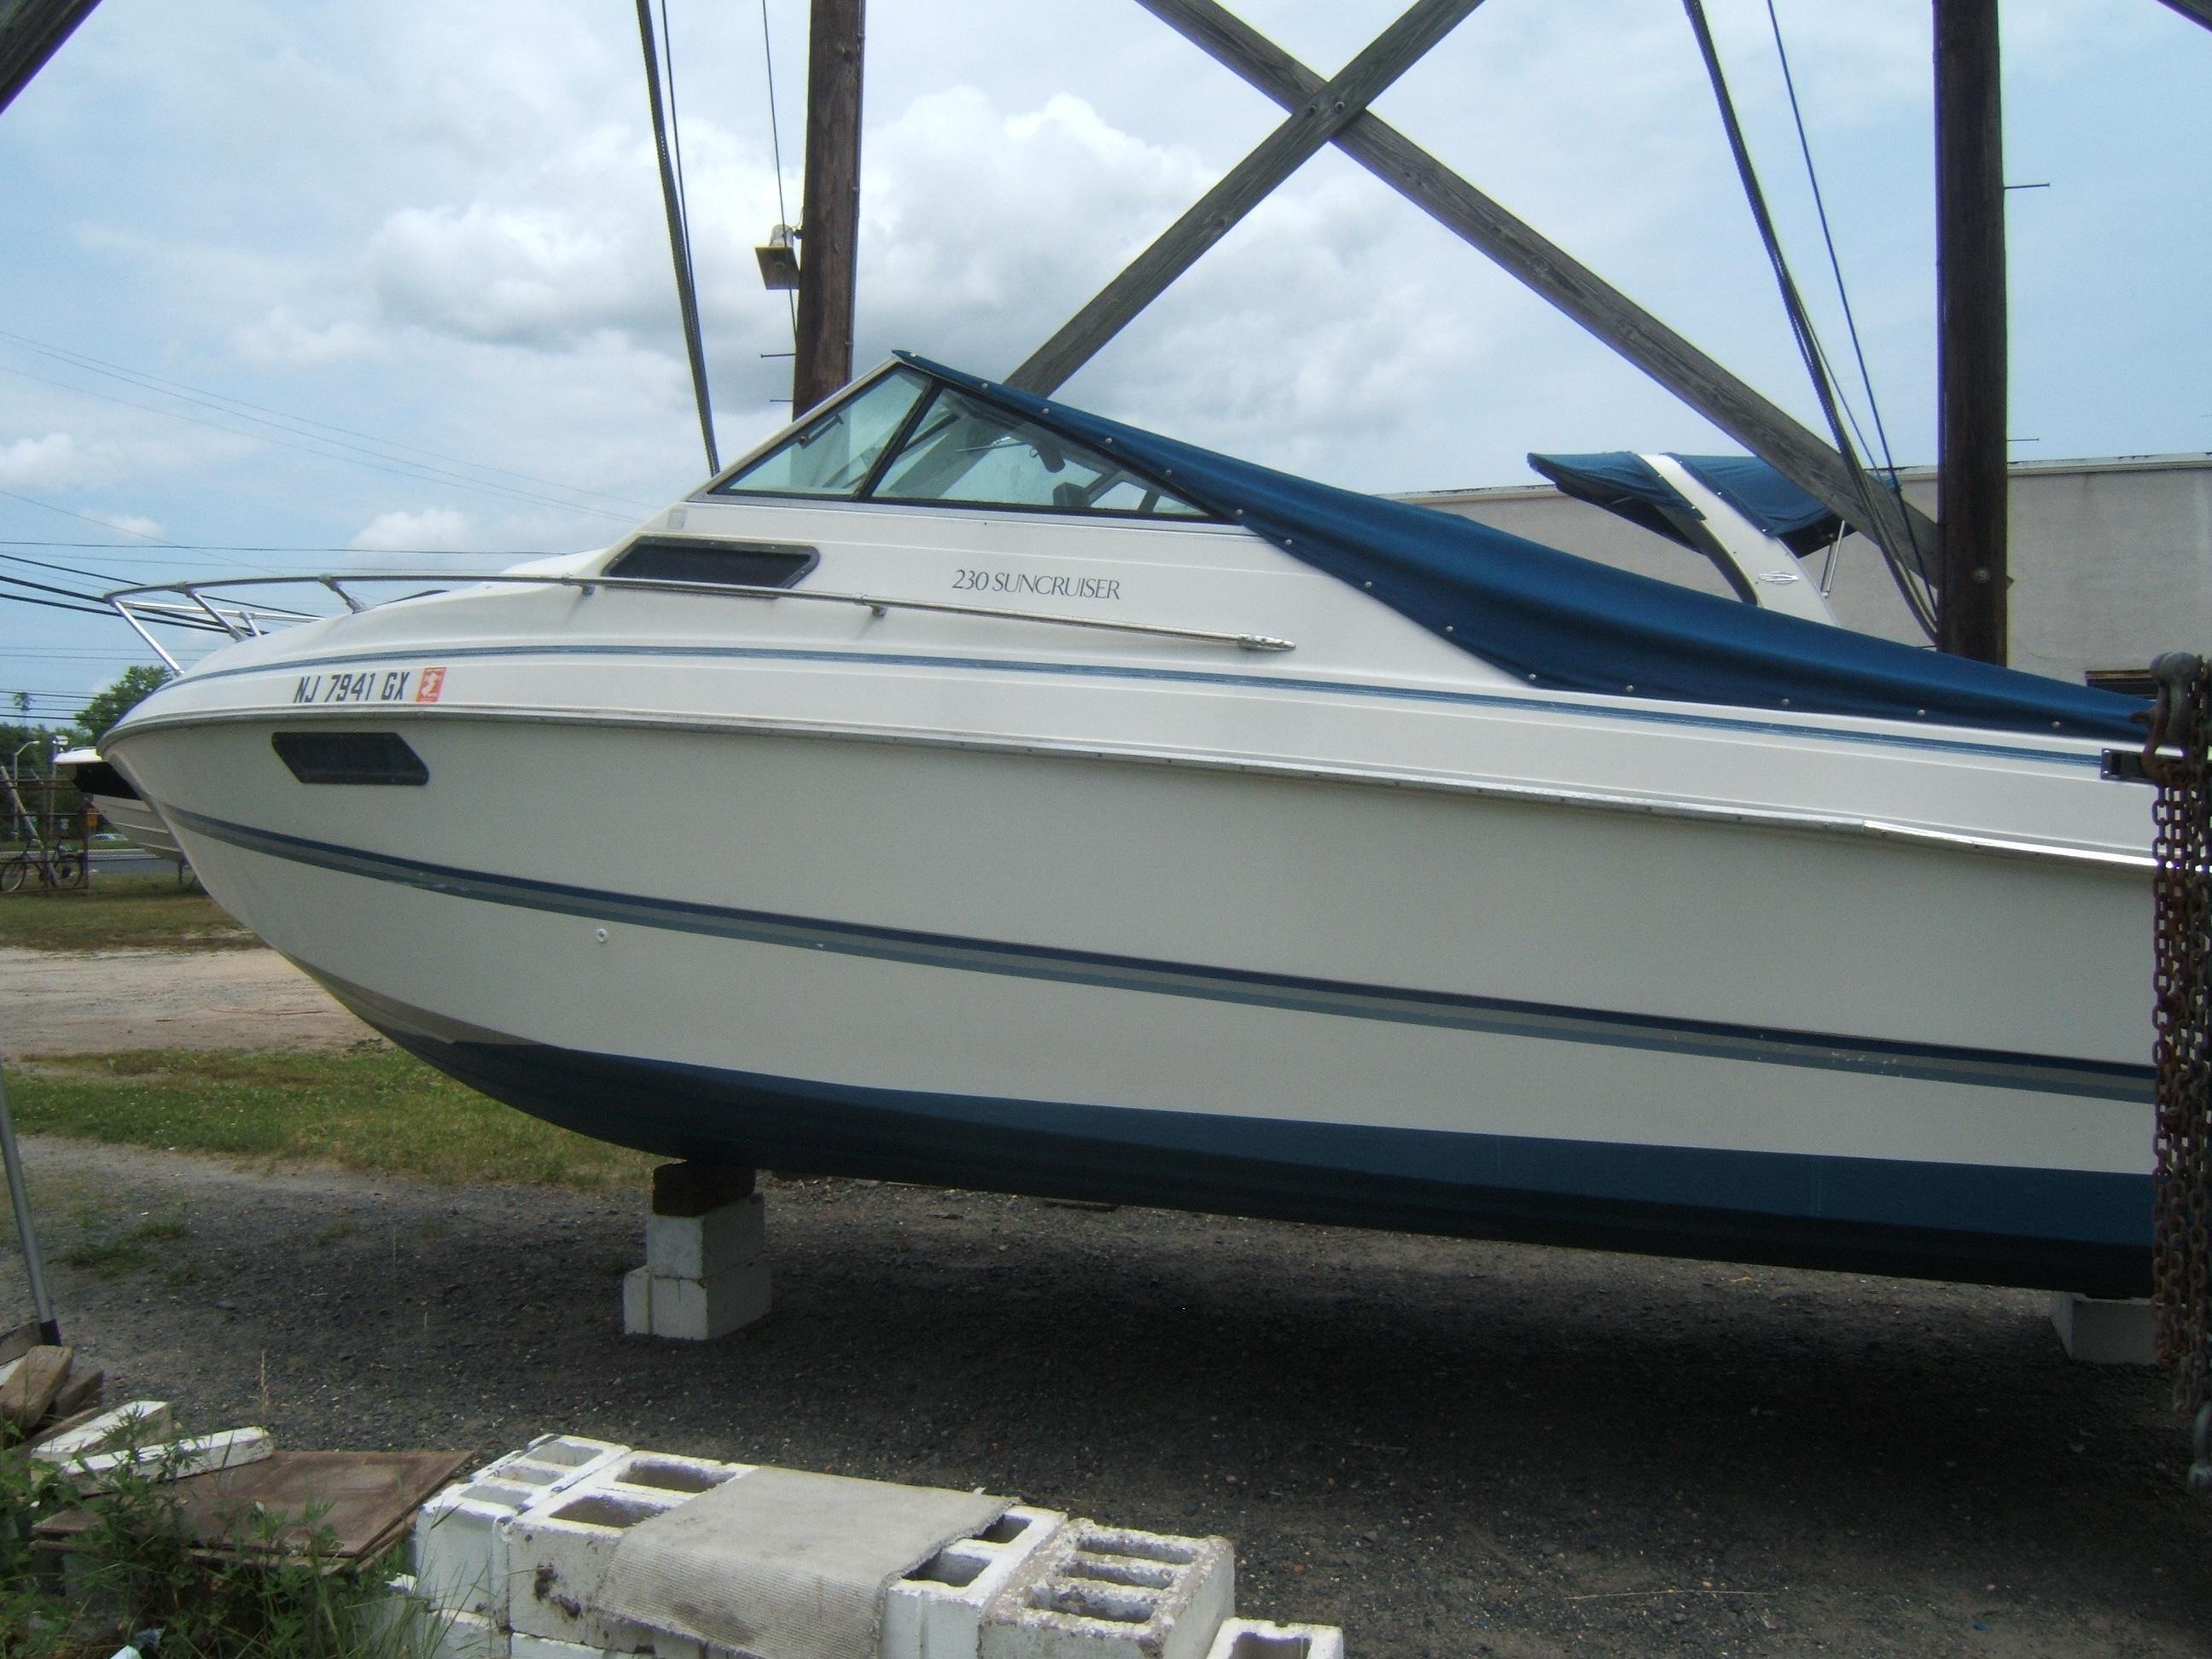 1982 wellcraft 23 cuddy cabin power boat for sale www